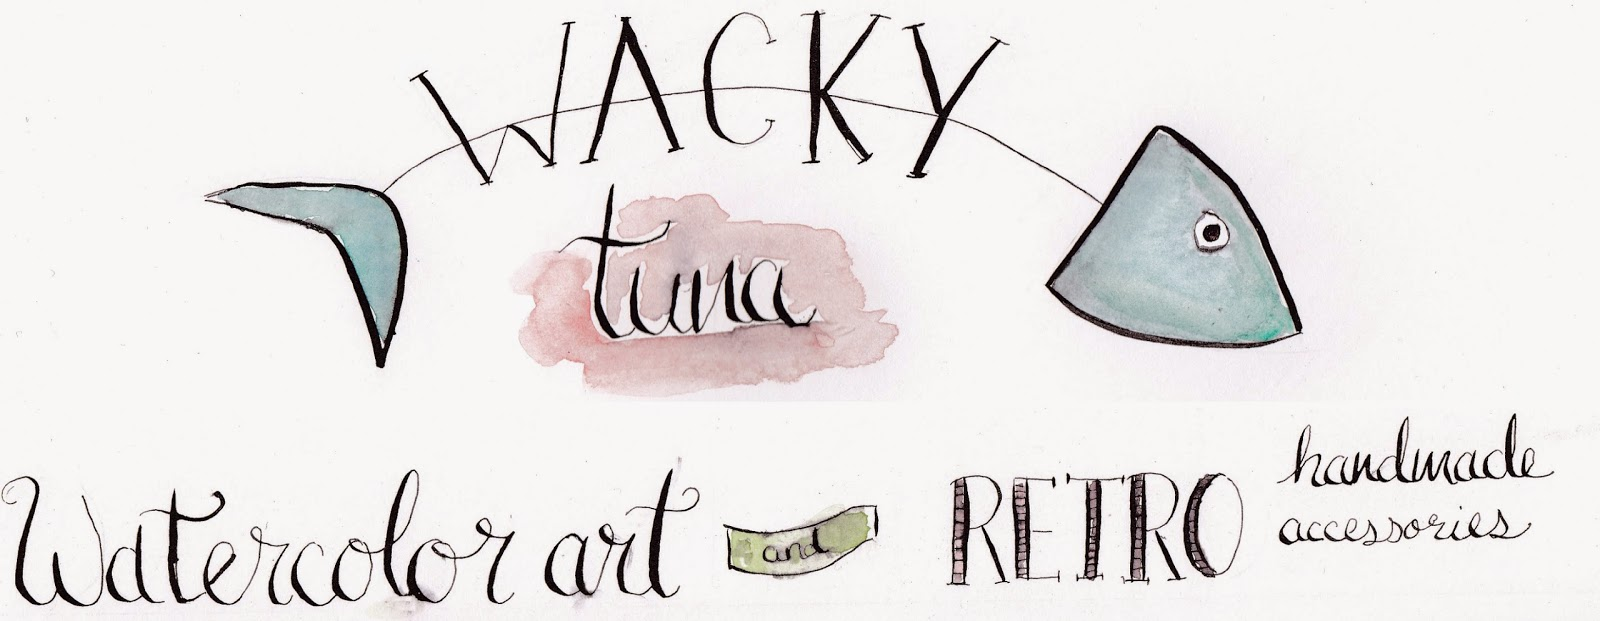 wacky tuna watercolor art and retro handmade accessories from va voom vintage